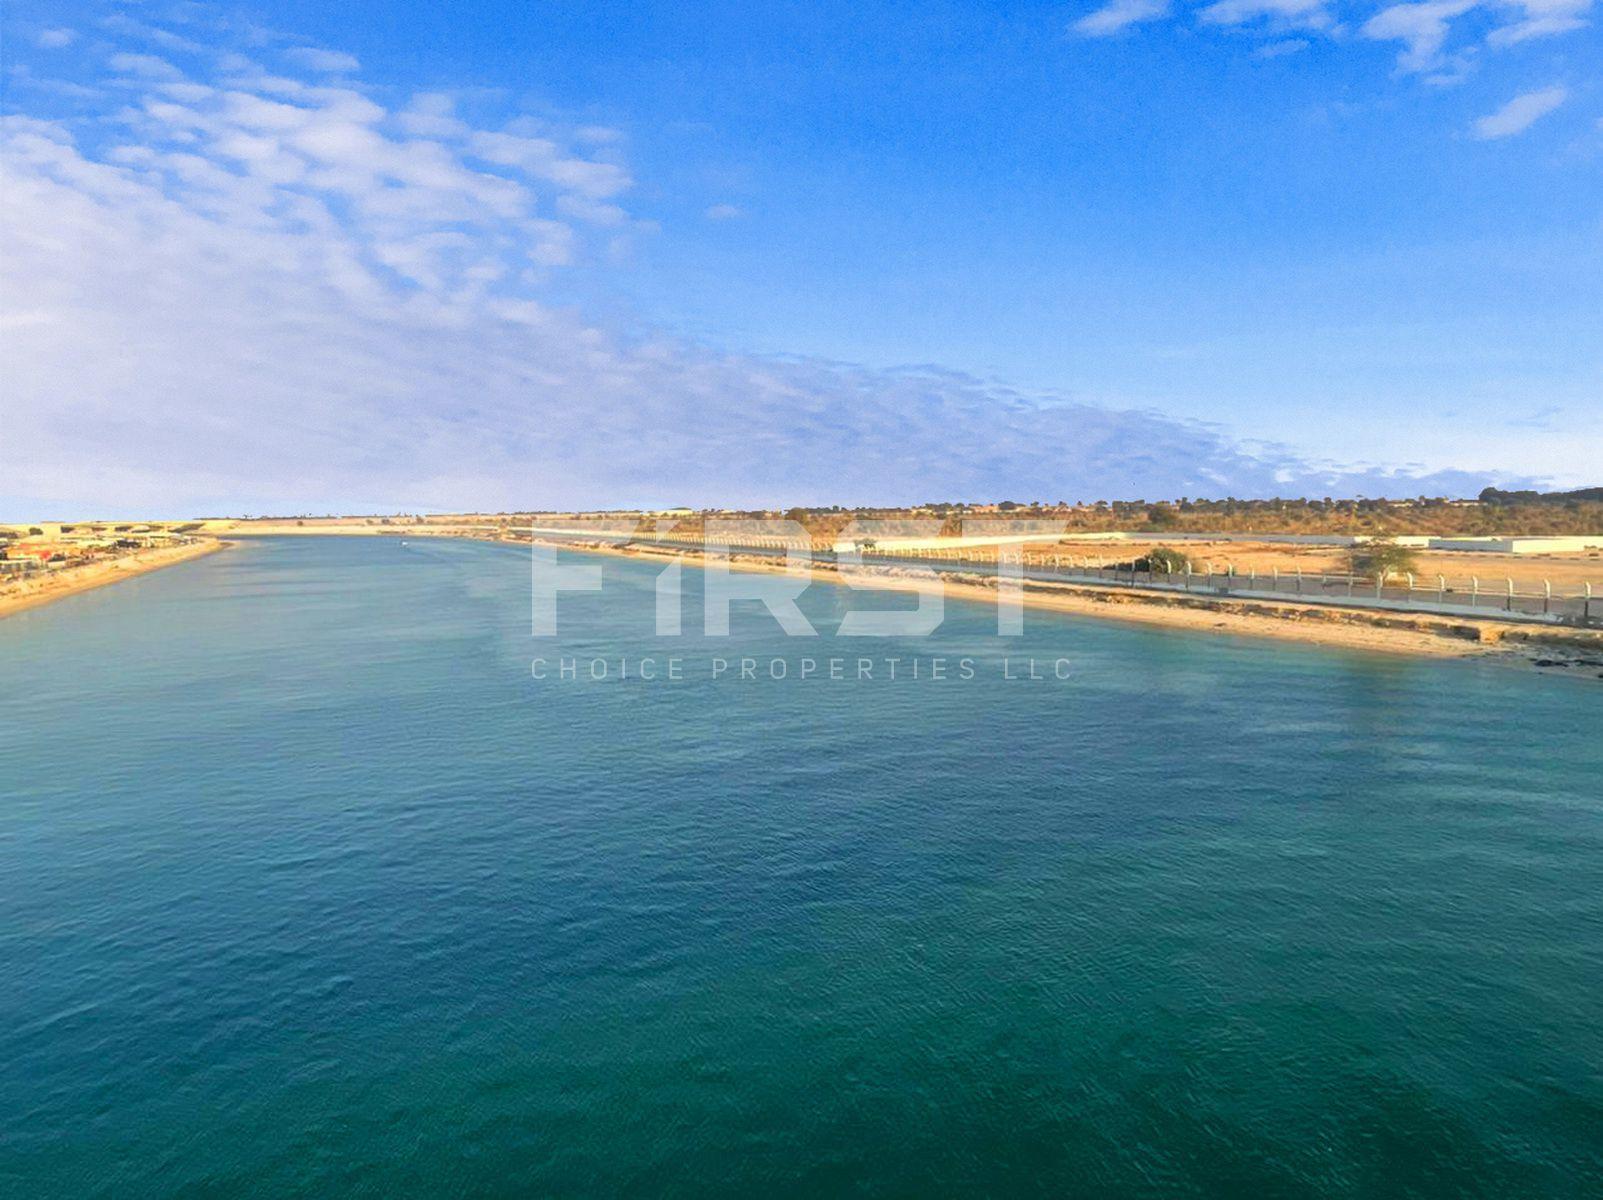 External Photos of Waters Edge Yas Island Abu Dhabi UAE (5).jpg